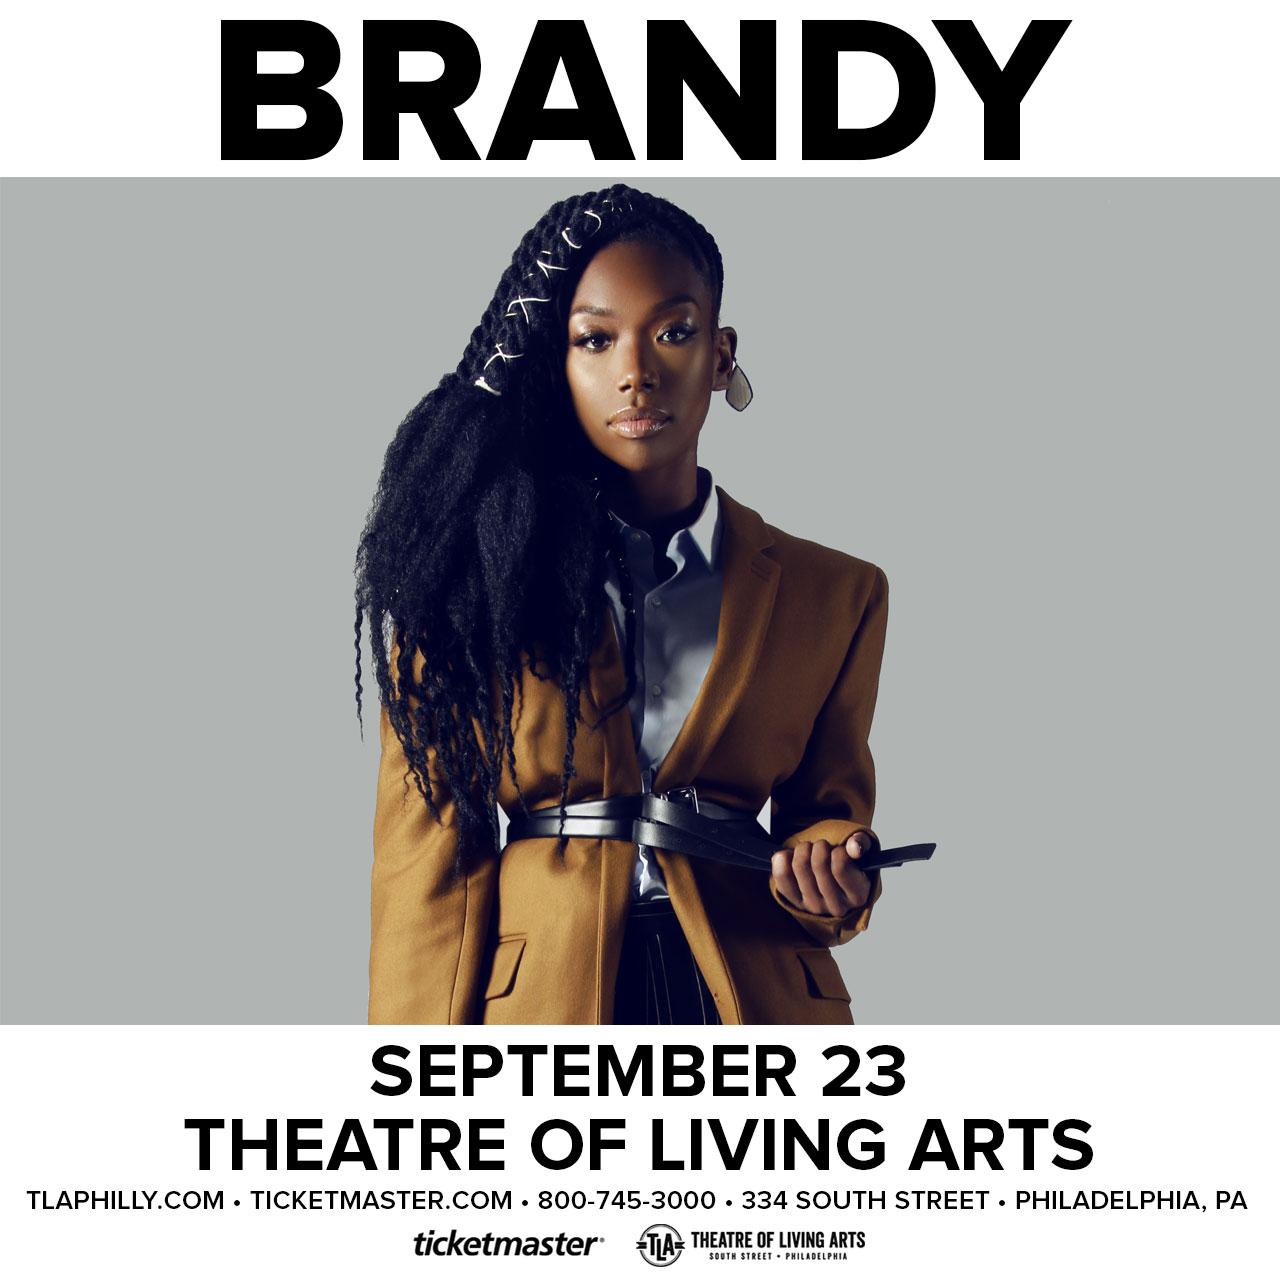 Brandy Concert Philly TLA sept 2017